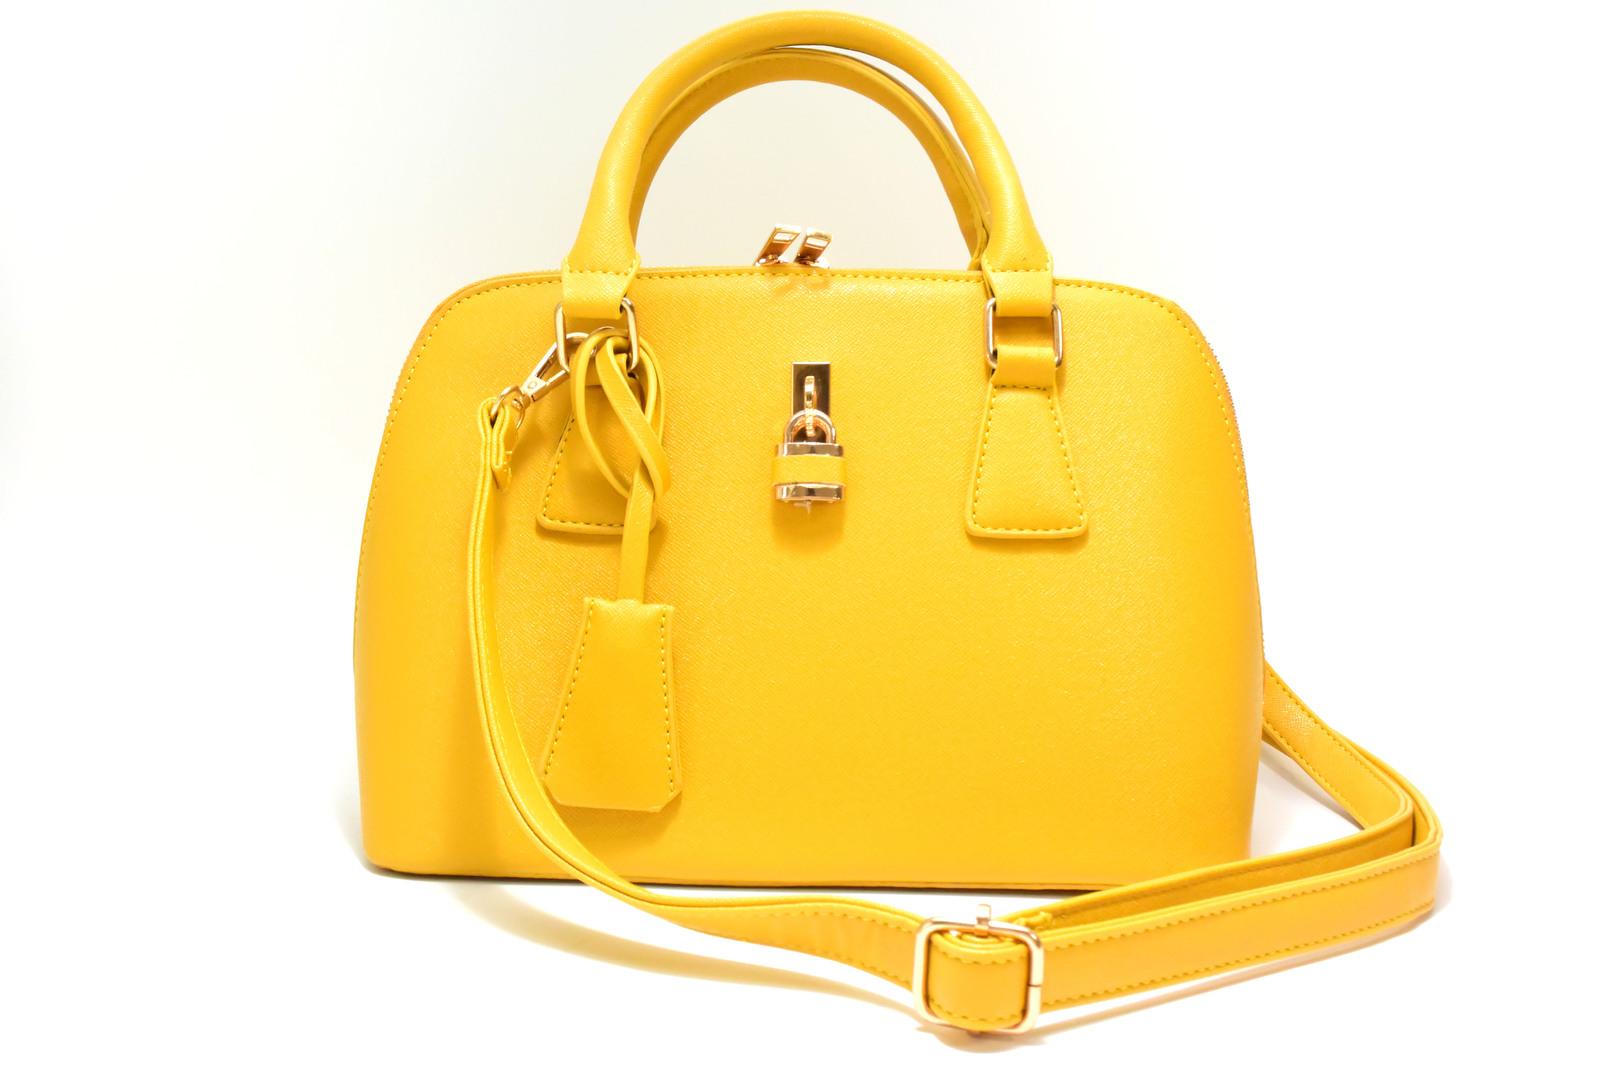 Recommend Us Handbag Back Bugatti Type Keyed Handbags Shoulder Cute Office Auktn Rpc